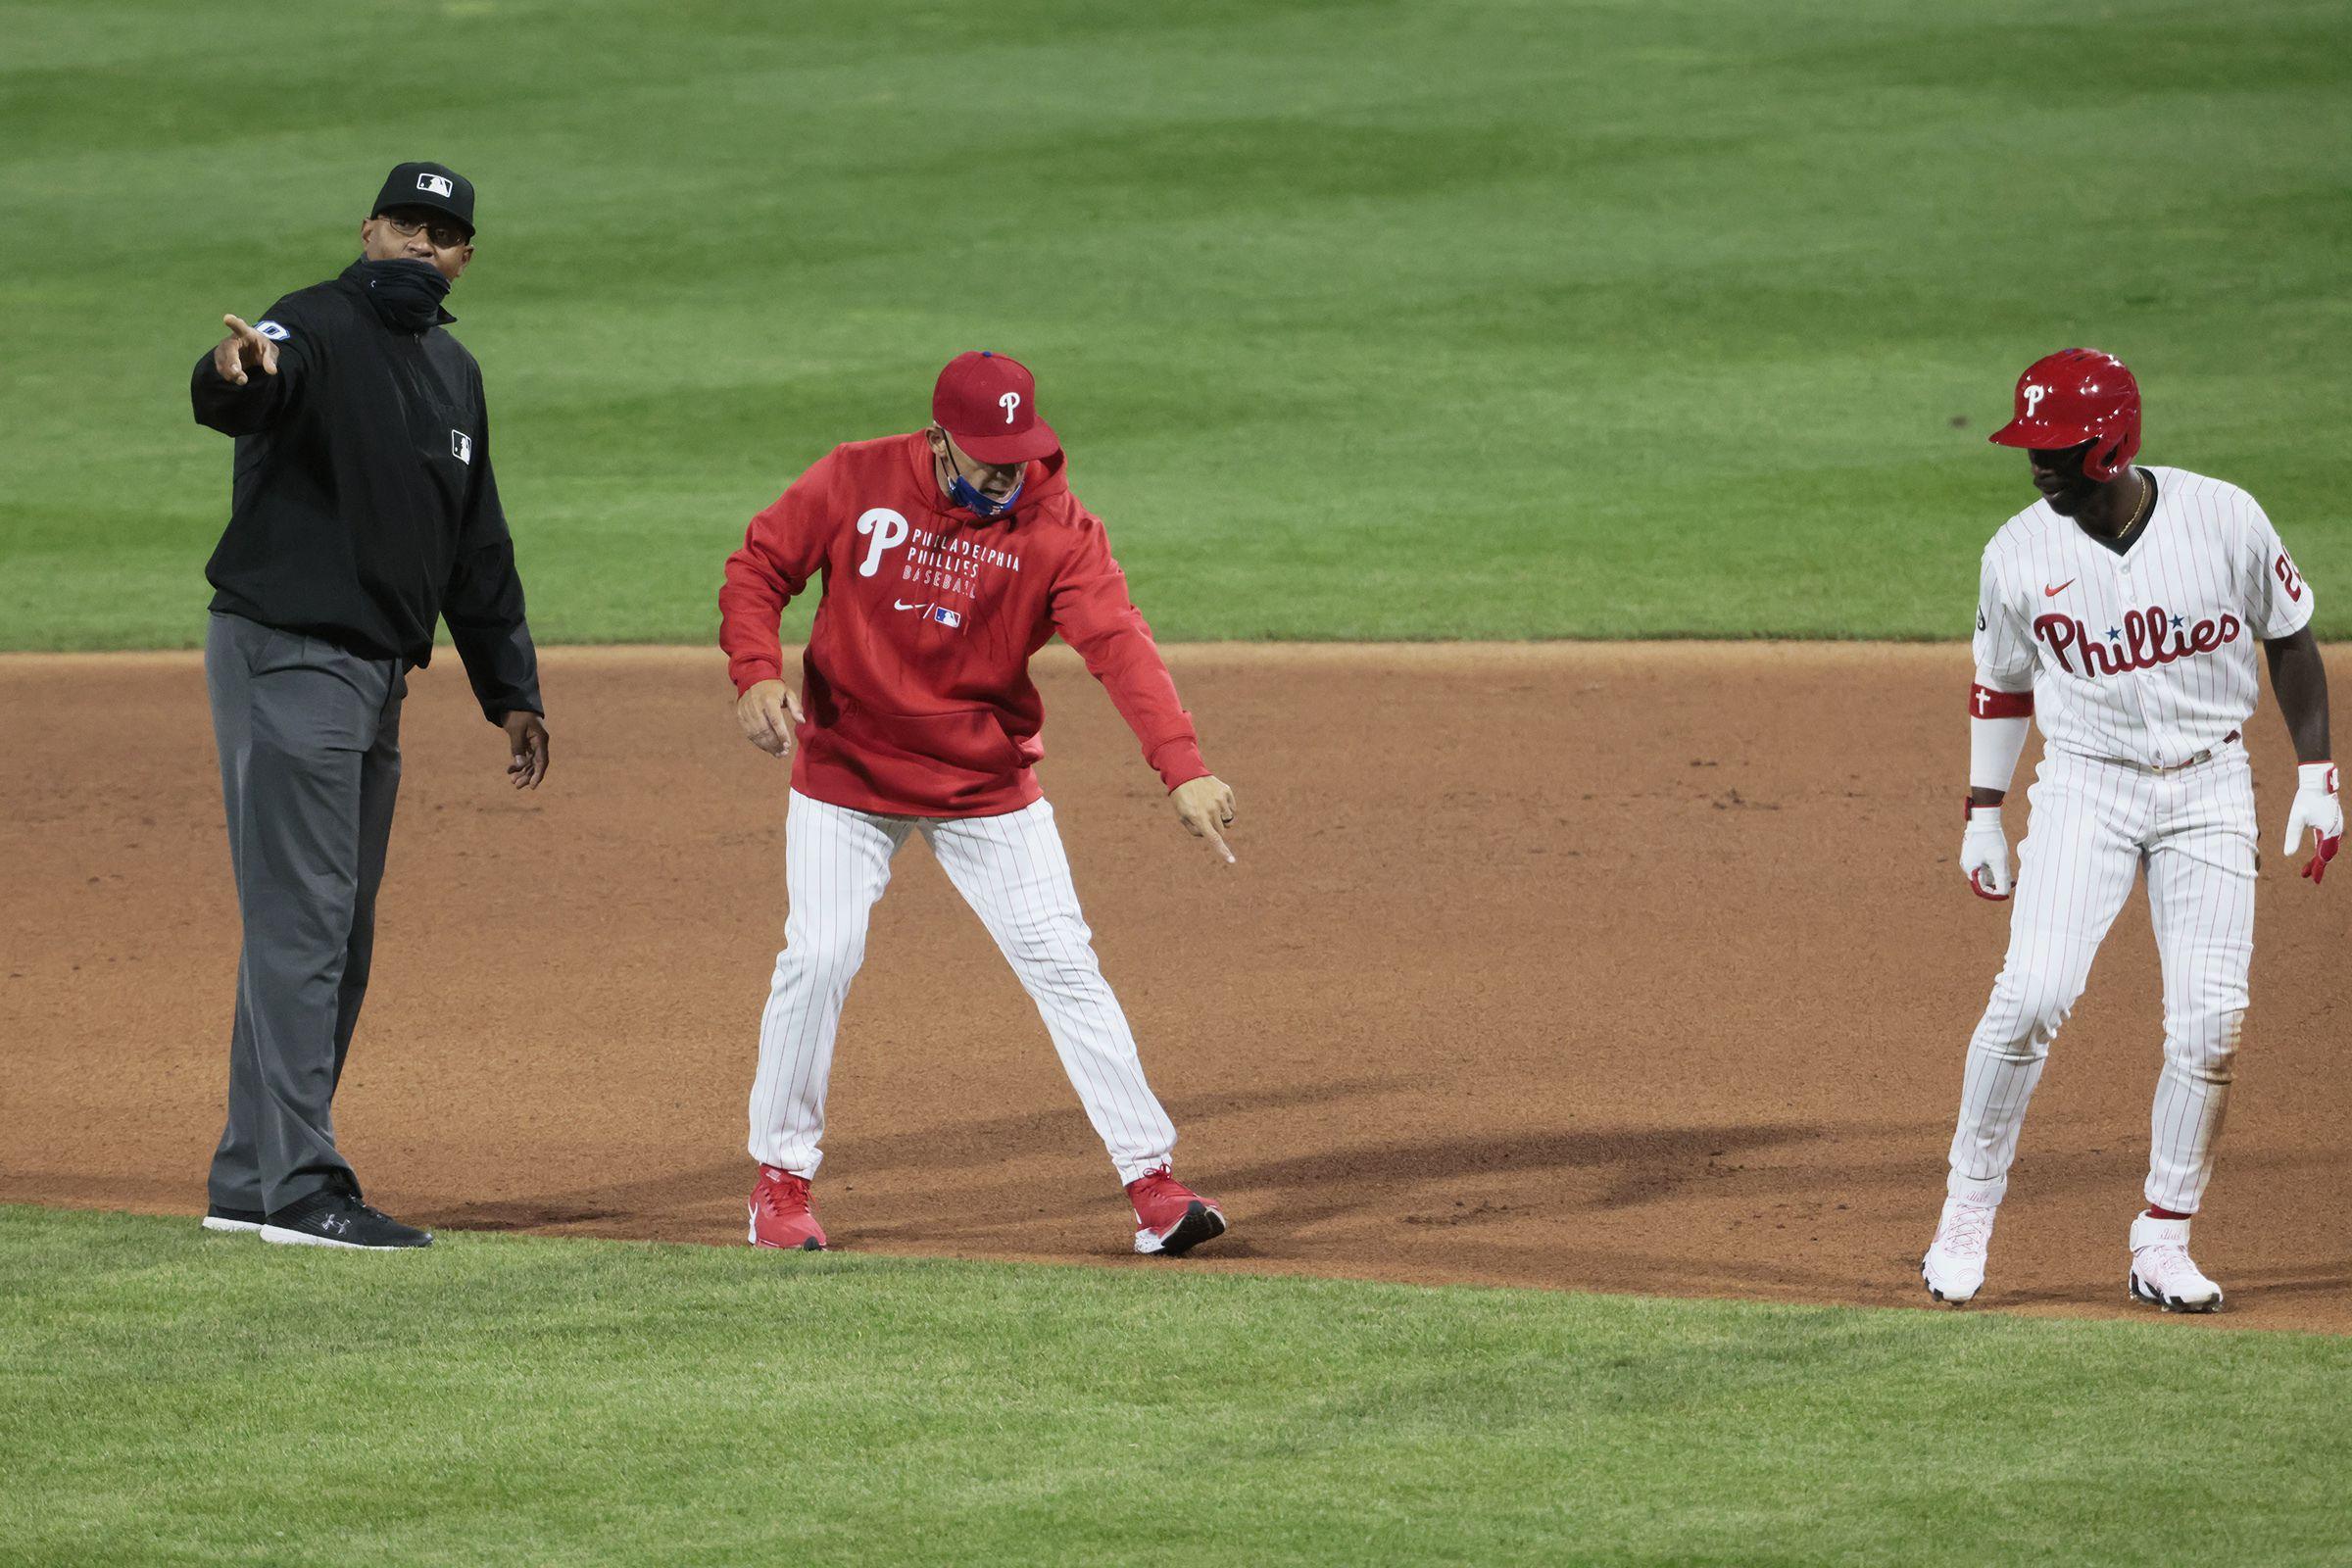 MLB umpires call Andrew McCutchen out on play and anger Joe Girardi.